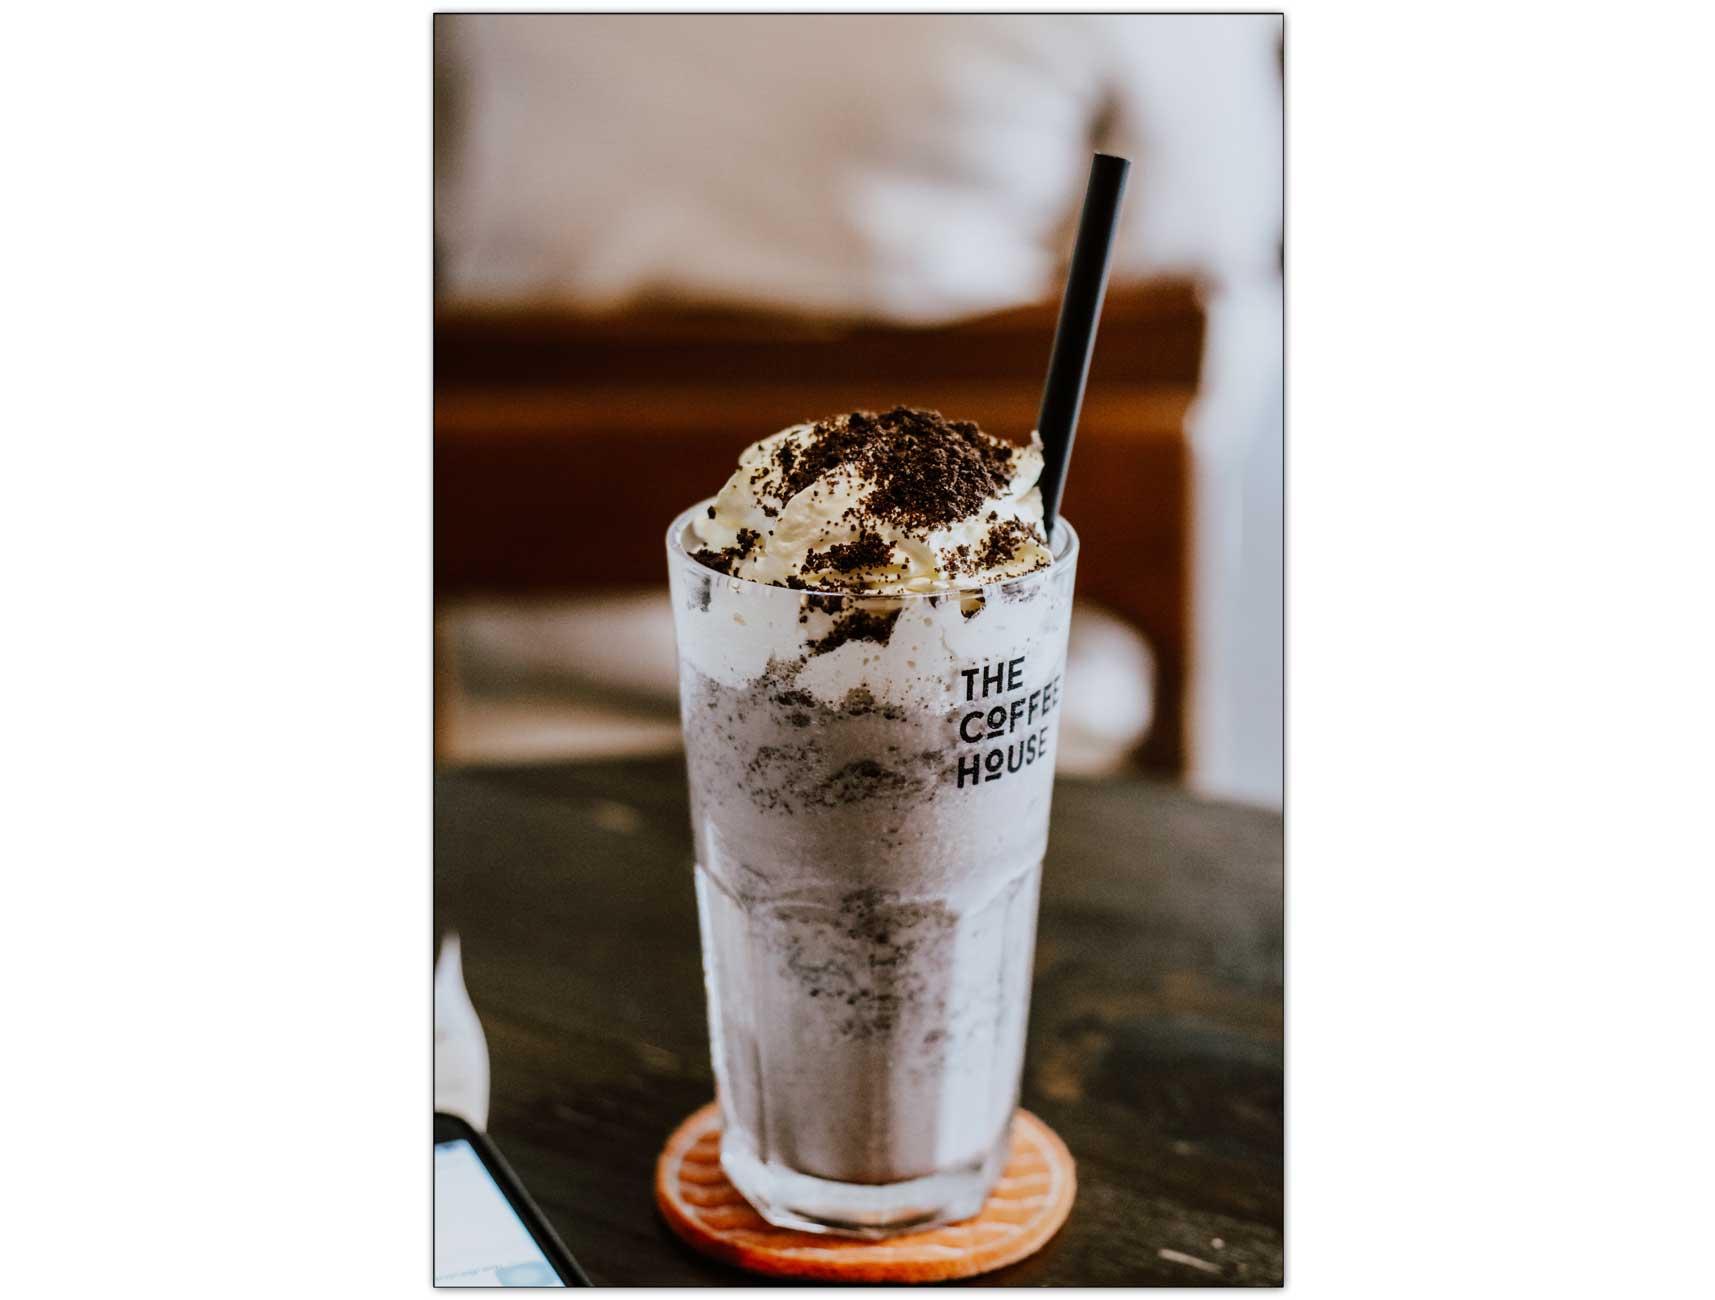 Milkshake irlandais, Café glacé alcoolisé, Café glacé crémeux alcoolisé